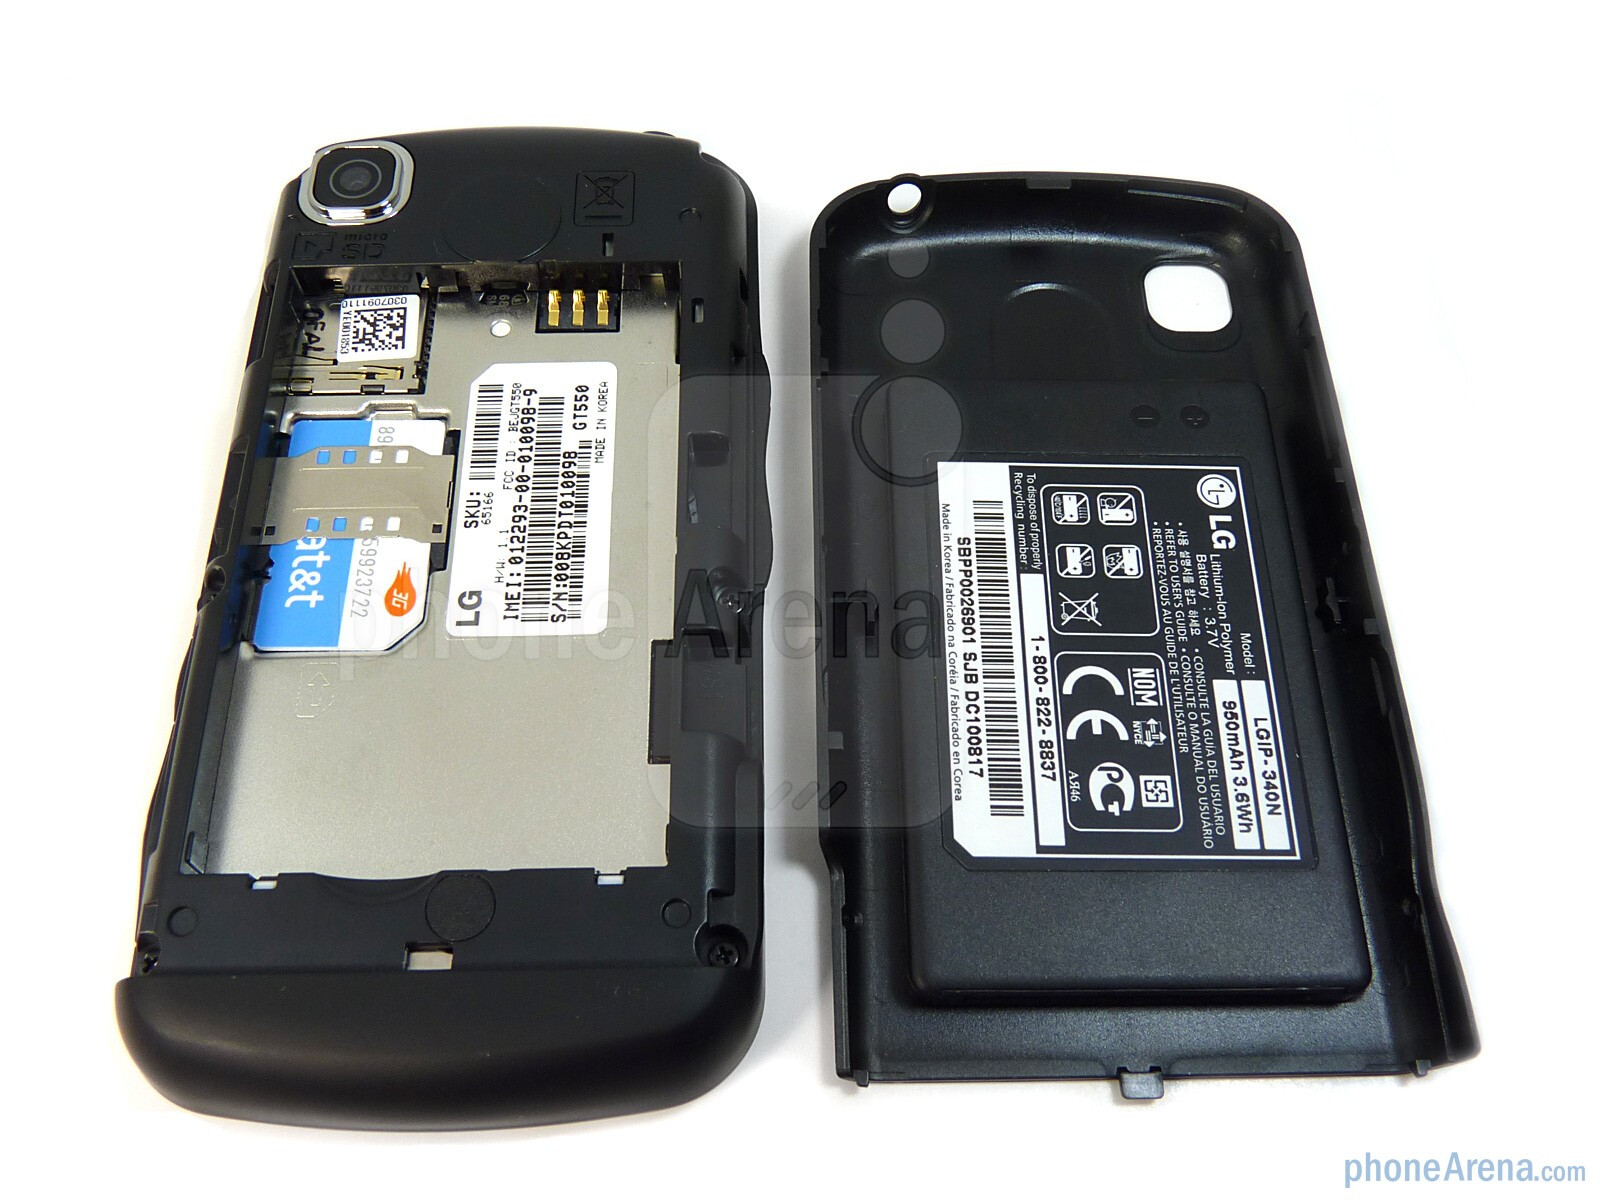 lg encore review rh phonearena com LG Touch Phone Operating Manual LG User Manuals